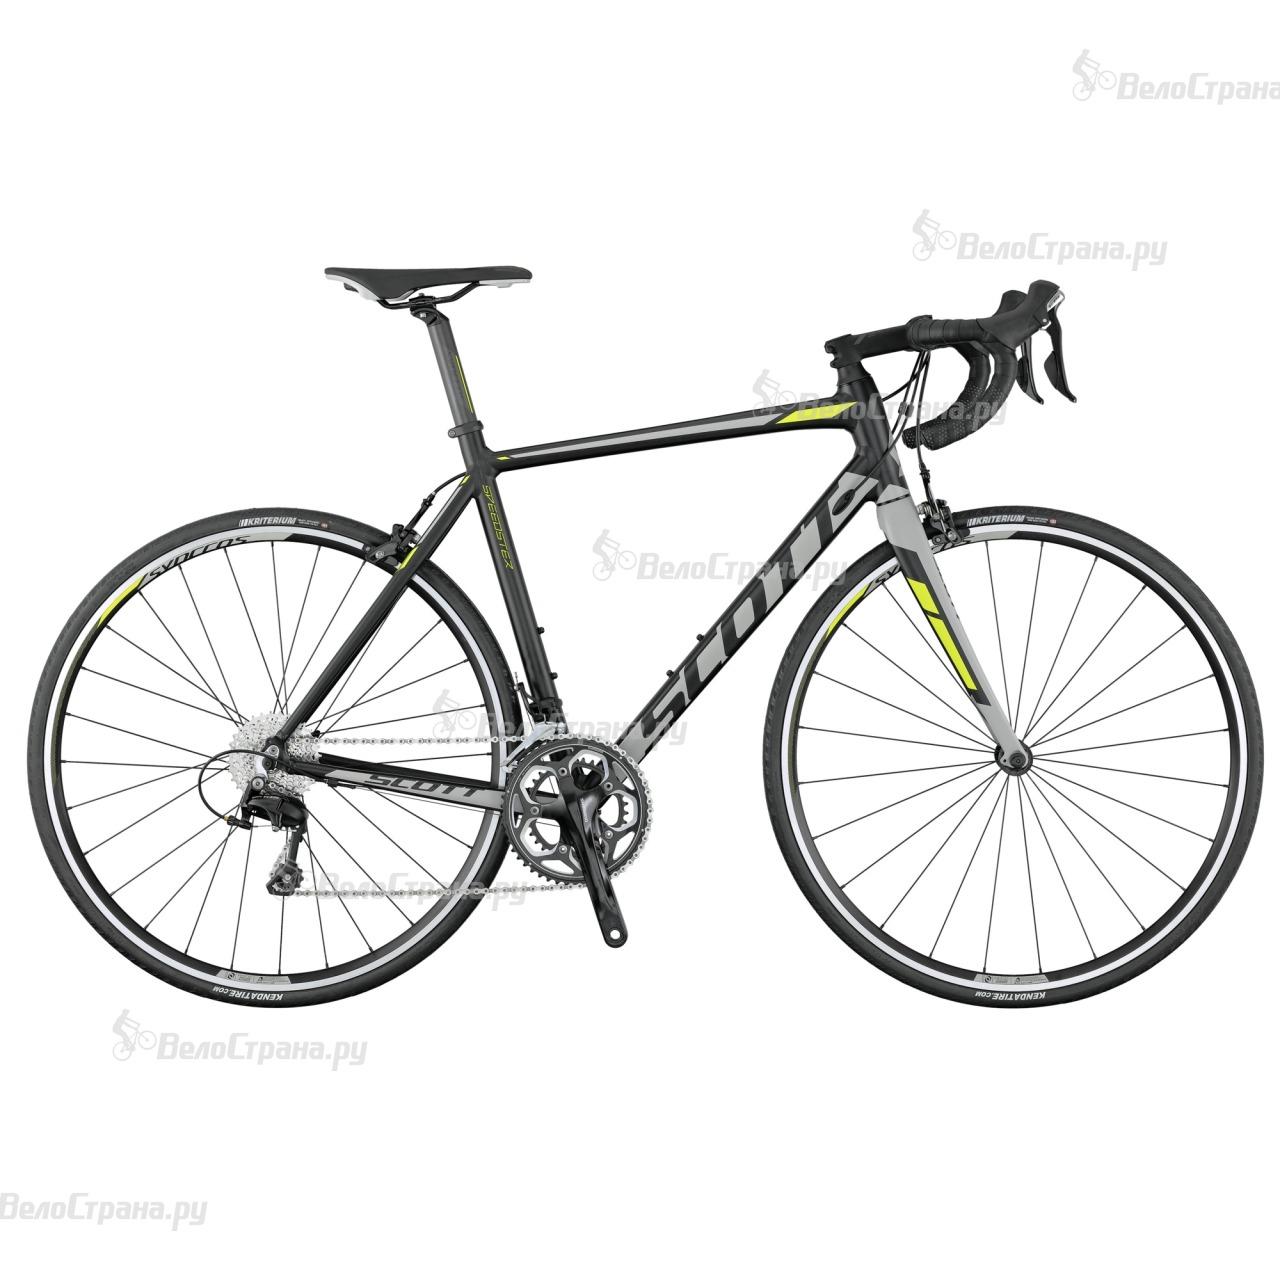 Велосипед Scott Speedster 10 (2017) крепление велосипедное of giant giant contact slr lite